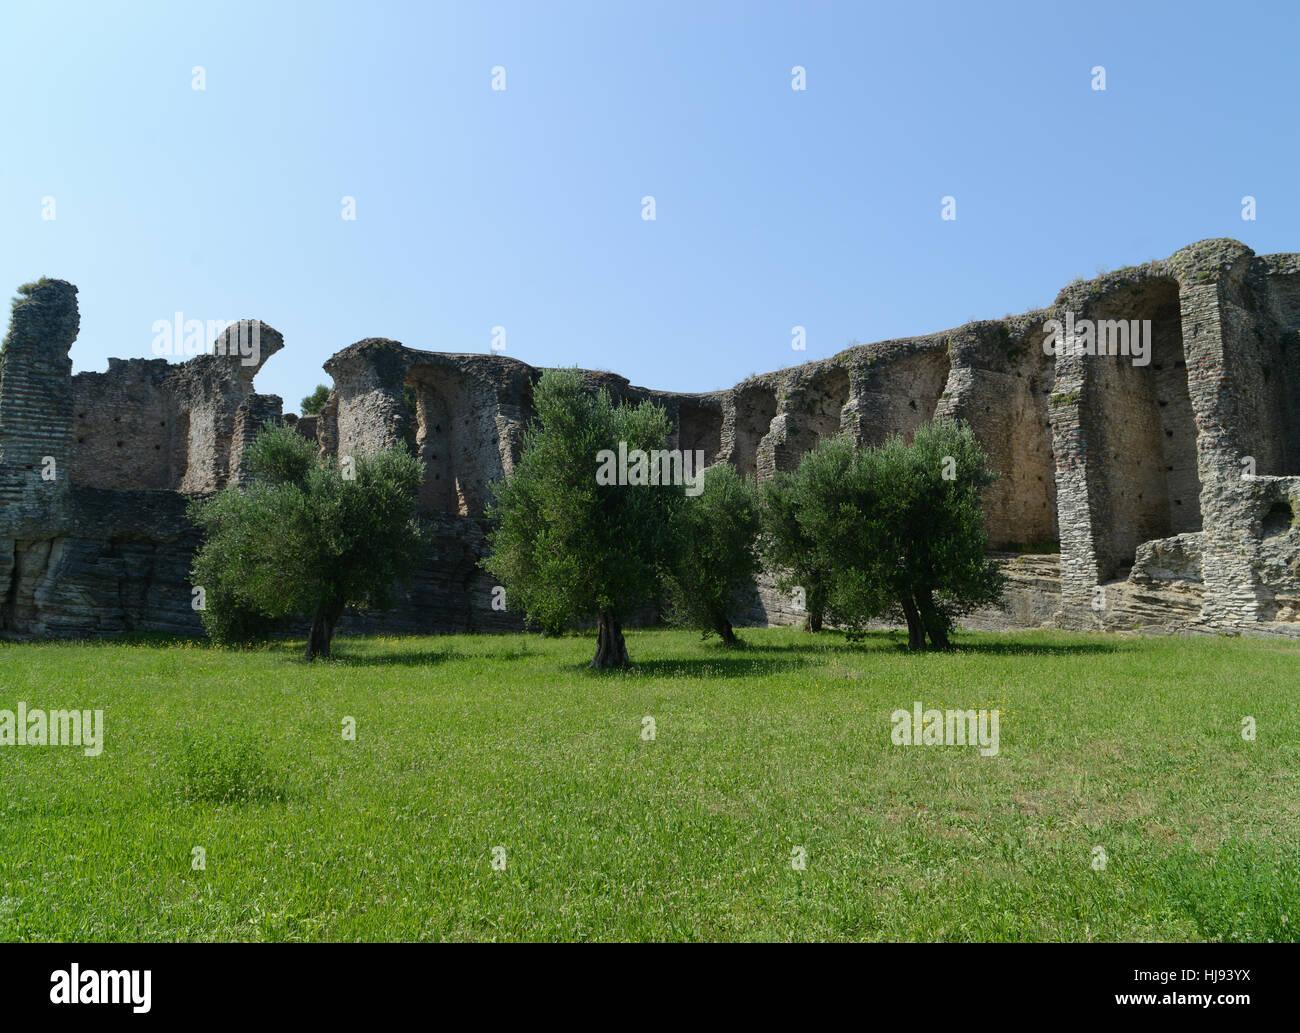 Ruins of Catullus Caves, roman villa in Sirmione, Garda Lake, Italy. Stock Photo